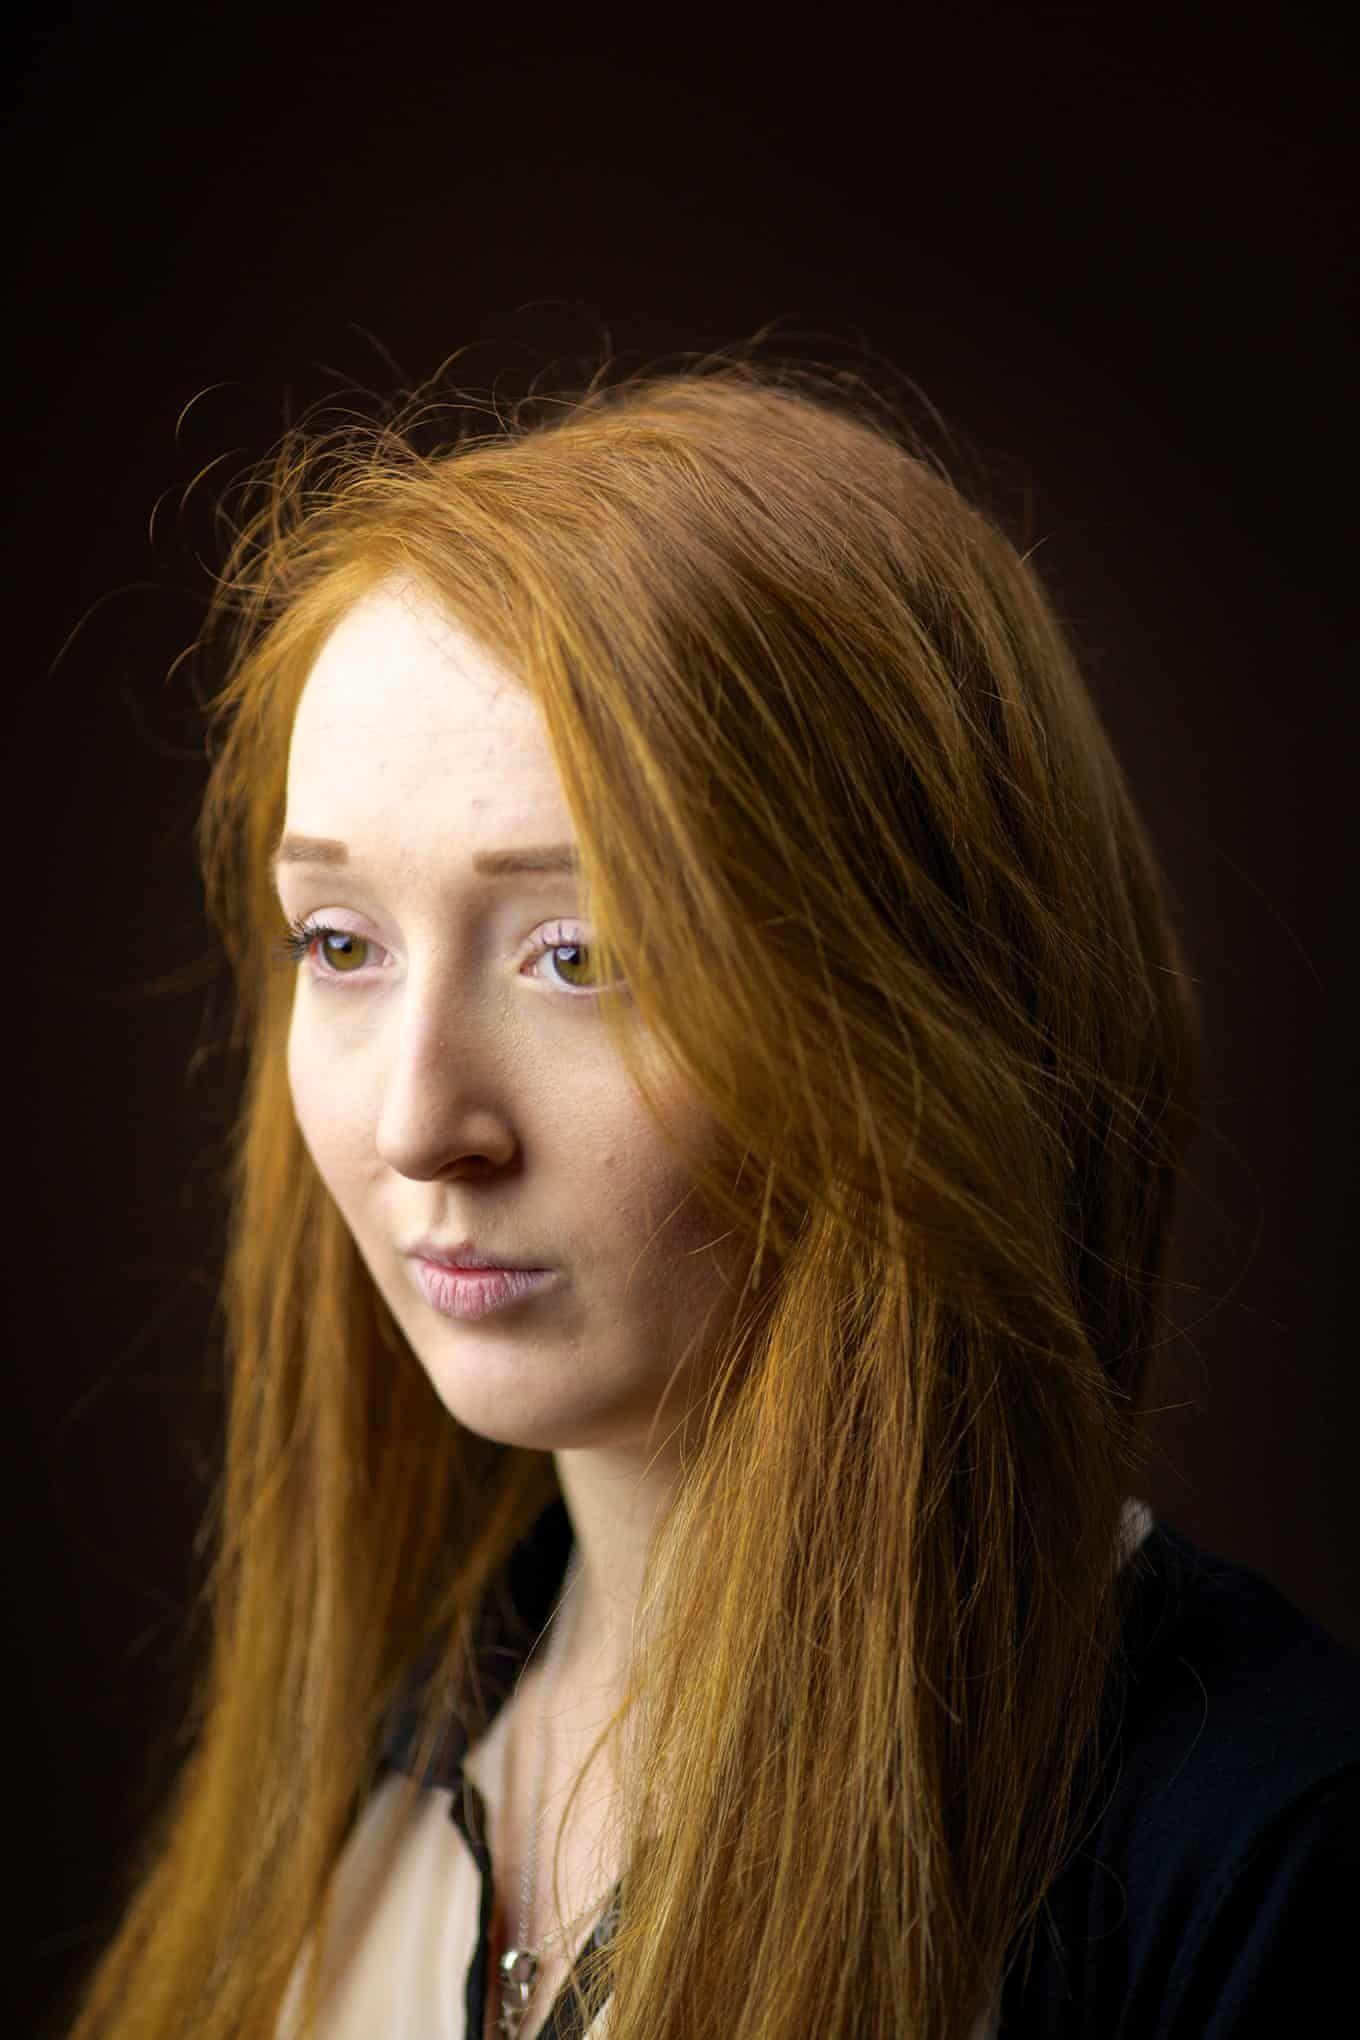 Busty scottish redhead - Sex archive.